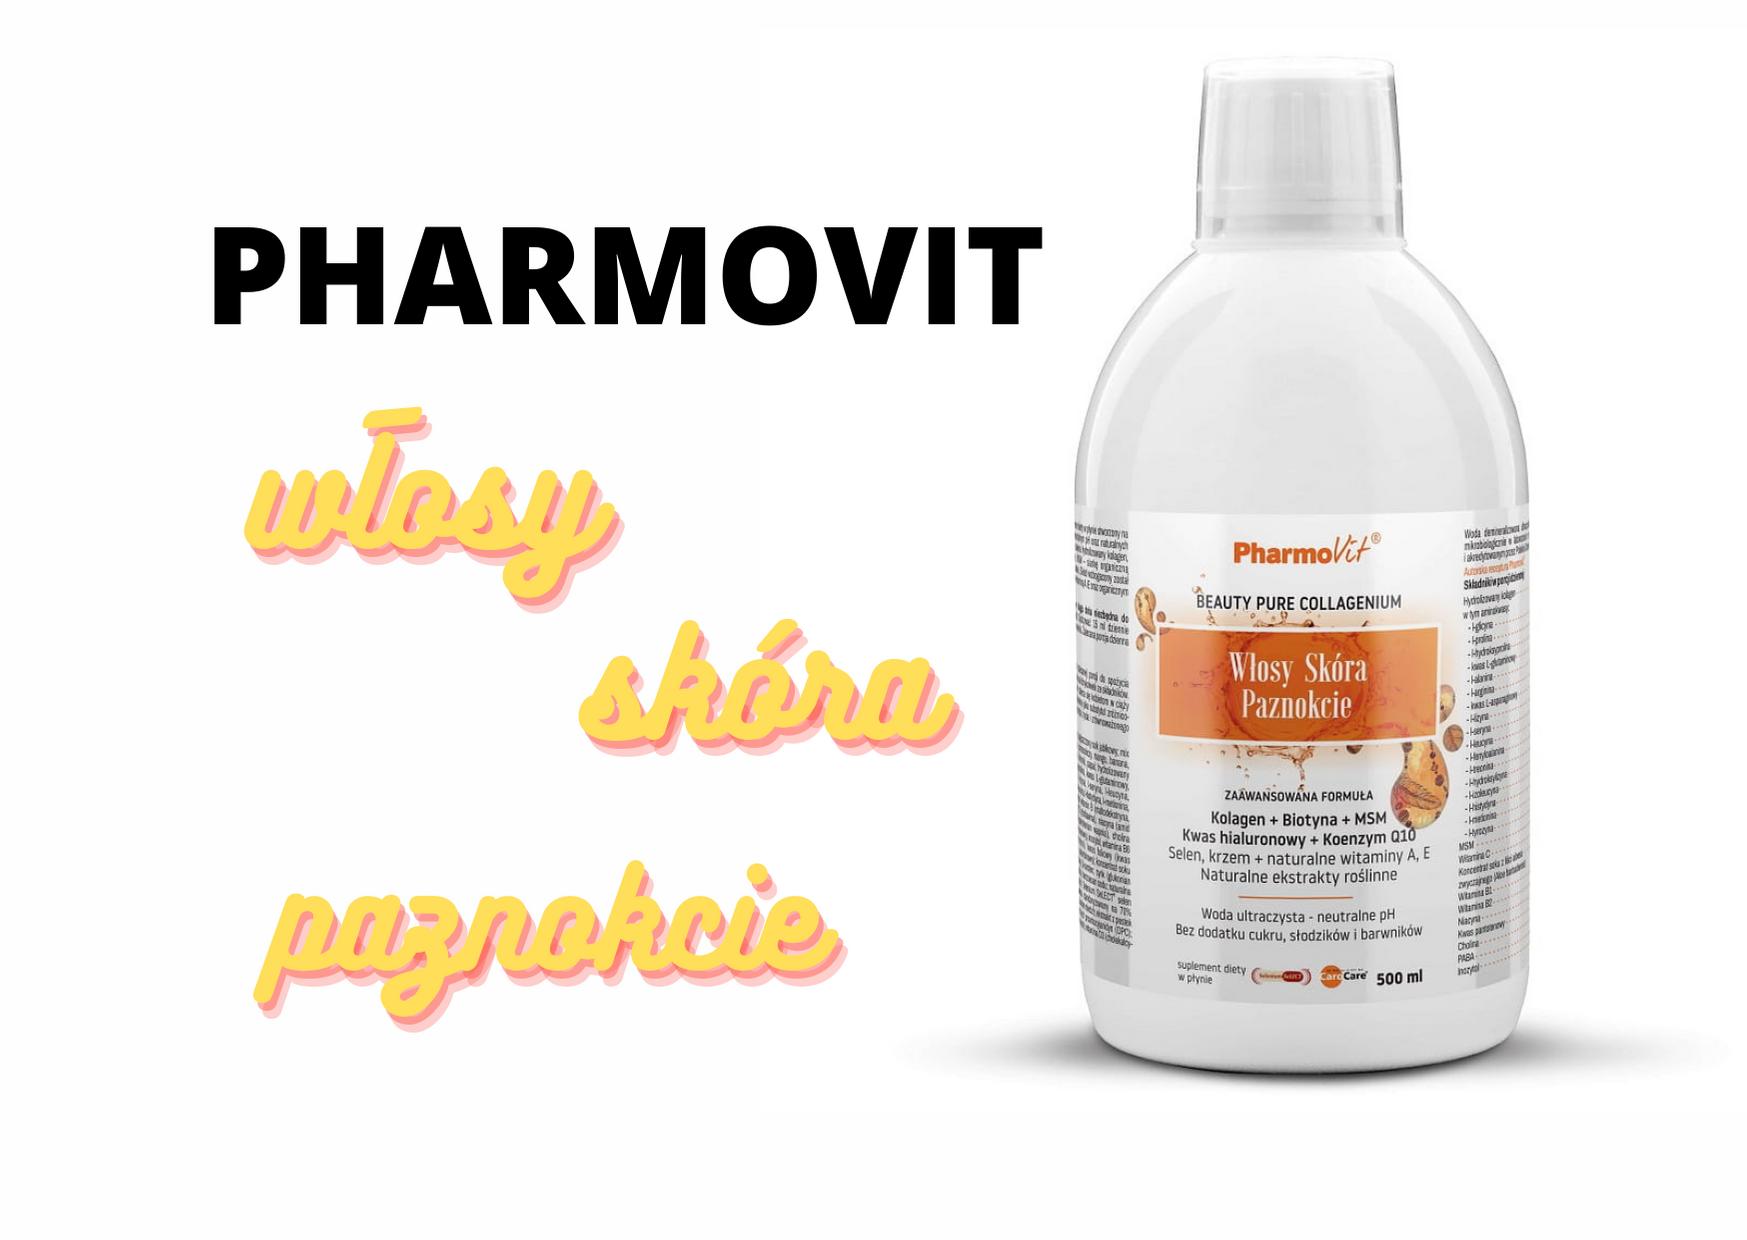 Pharmovit- włosy, skóra i paznokcie